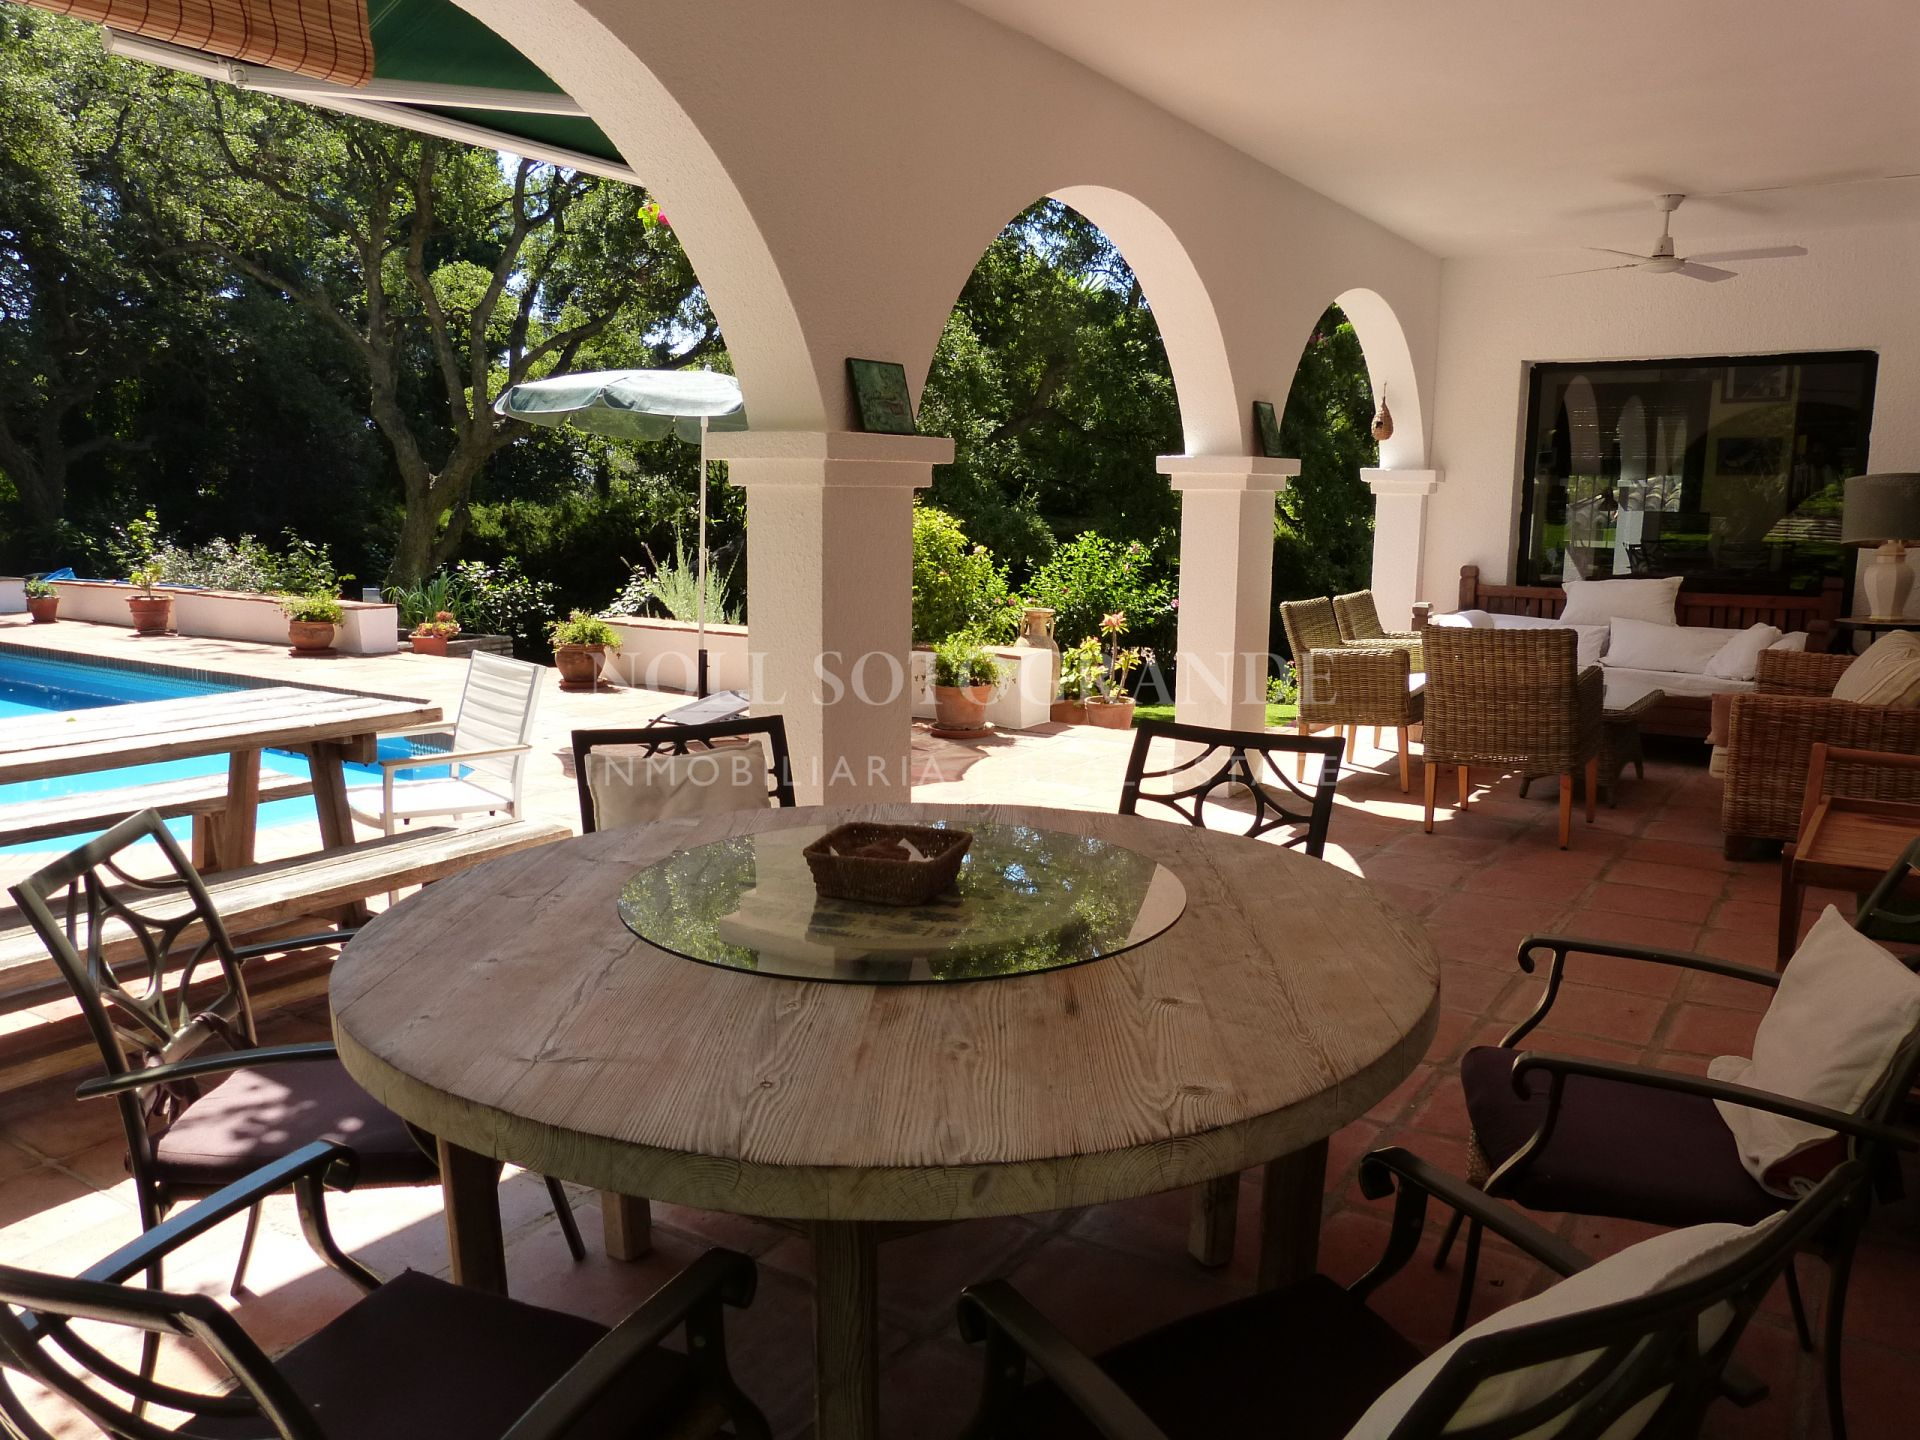 Casa tradicional con encanto lindando al campo de golf Valderrama